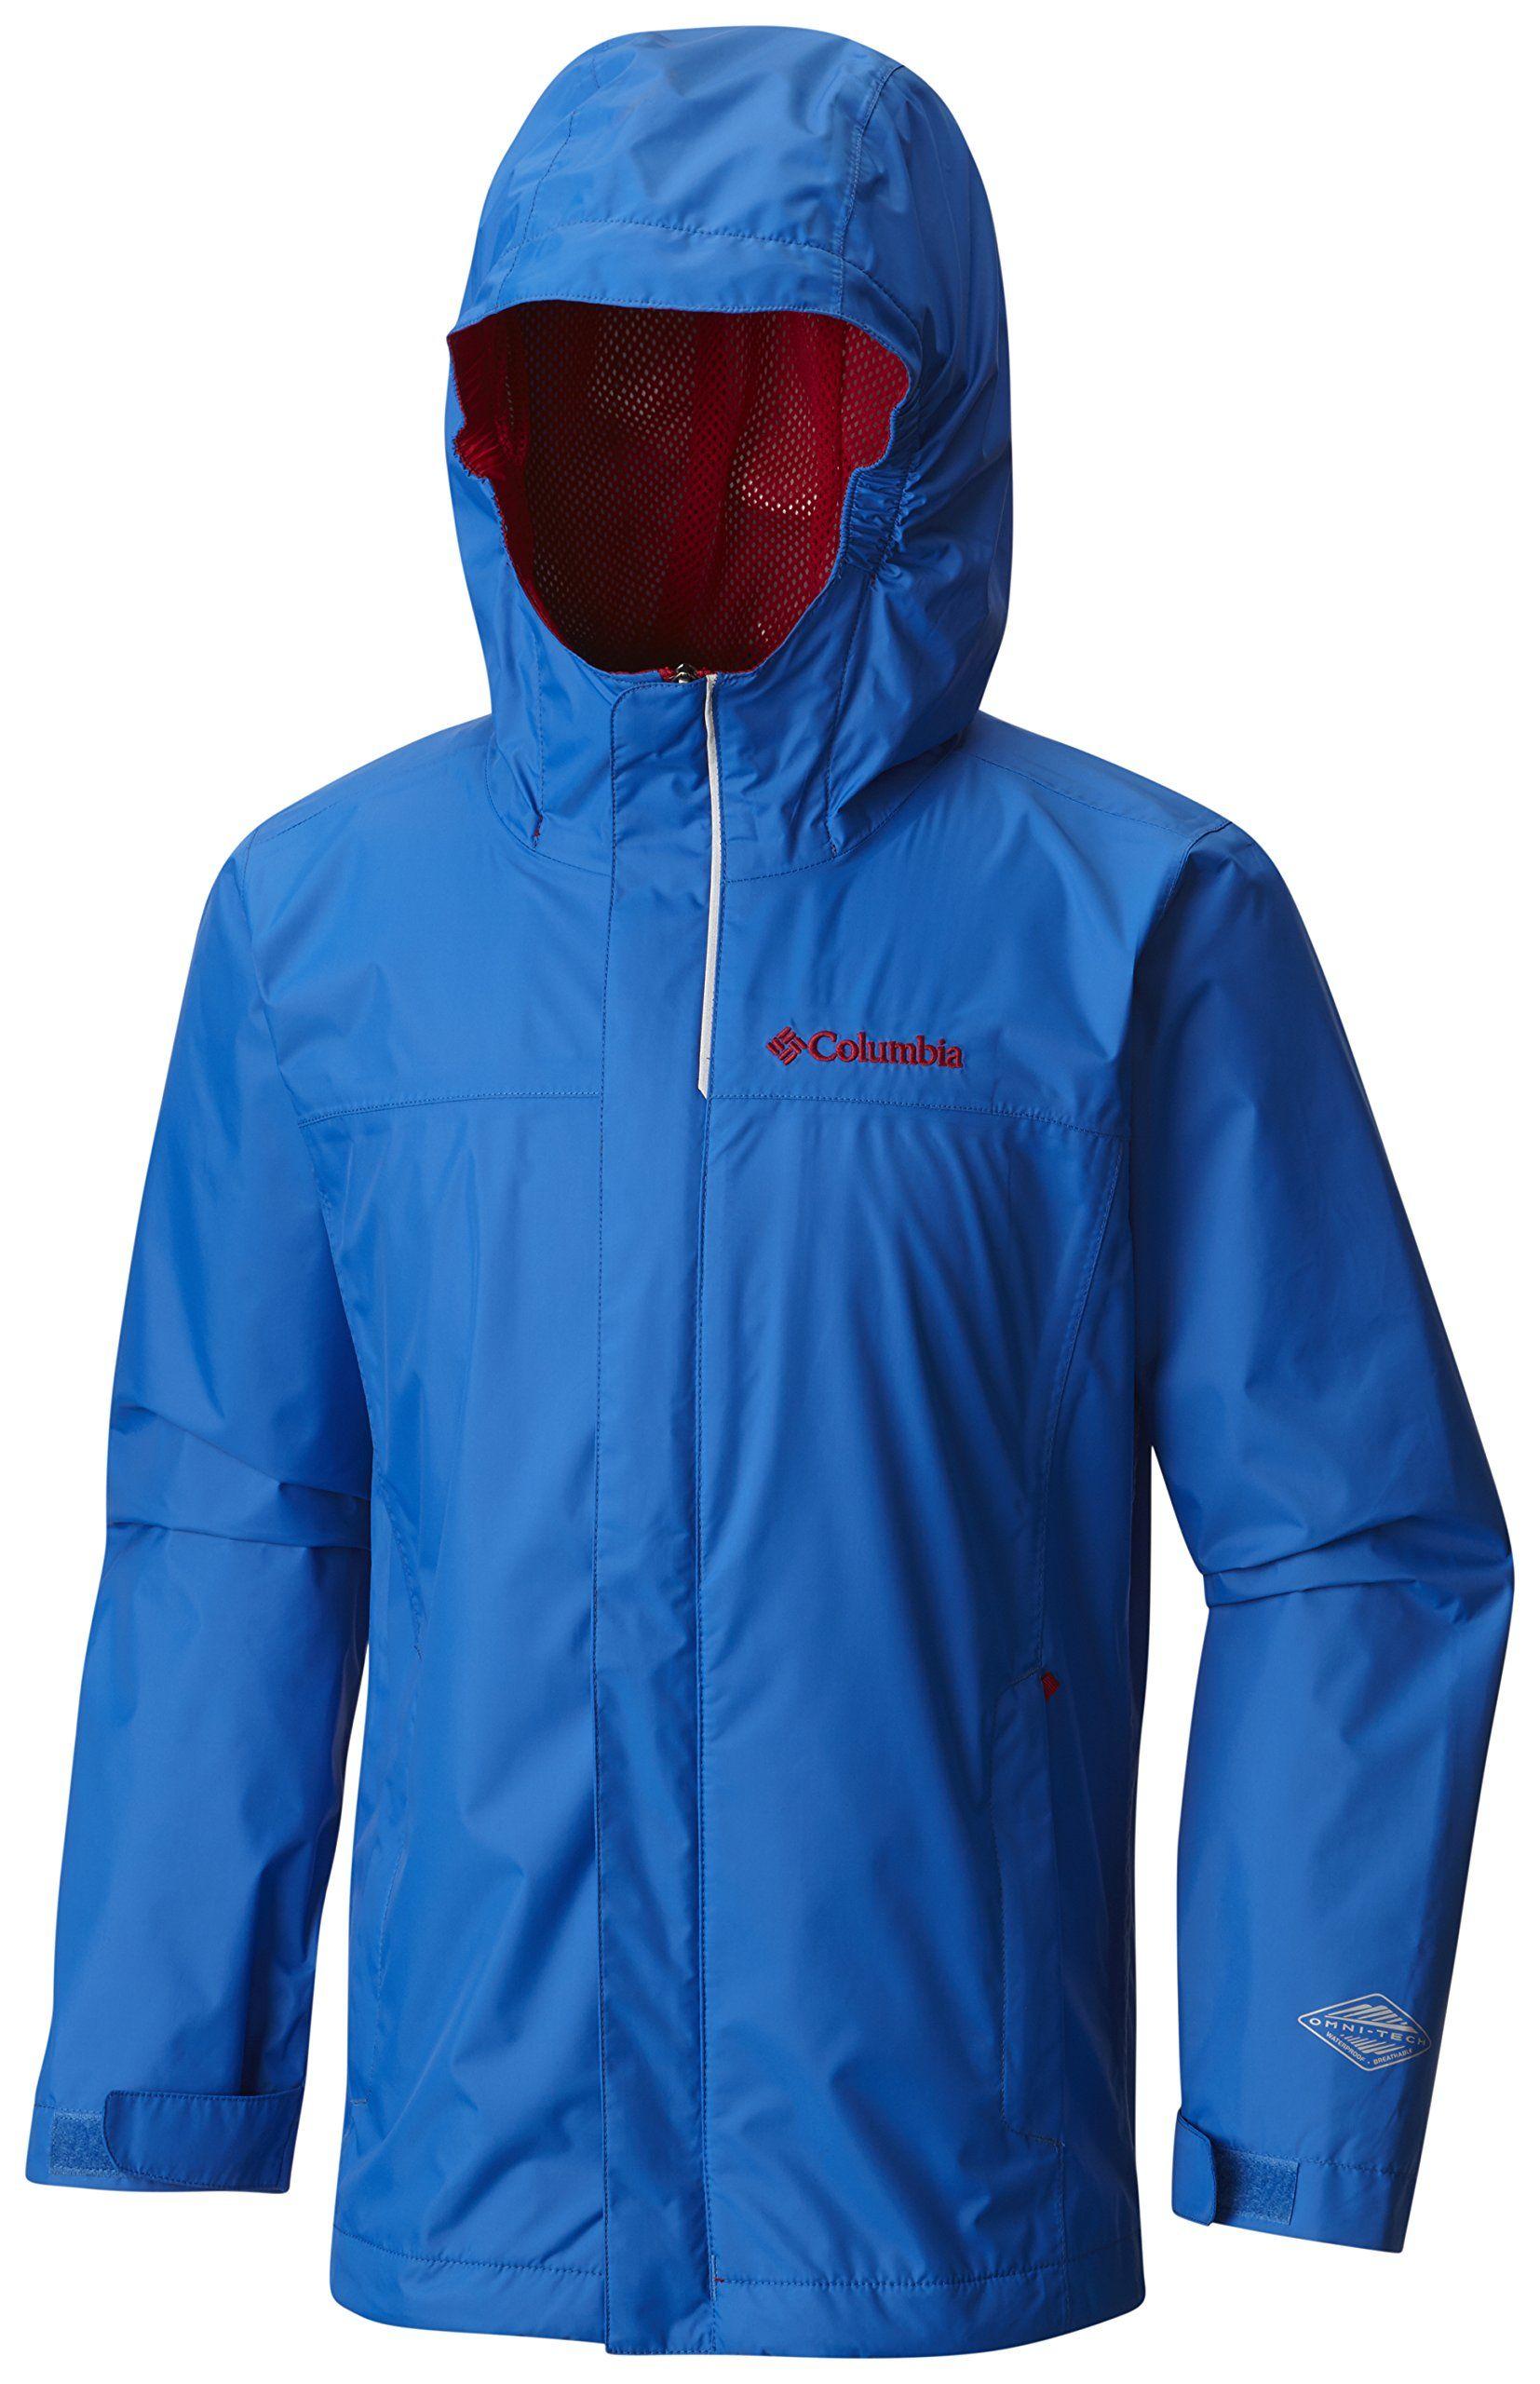 8fc264cc3 Columbia Big Boys' Watertight Jacket, Super Blue, Medium. Omni-tech  waterproof